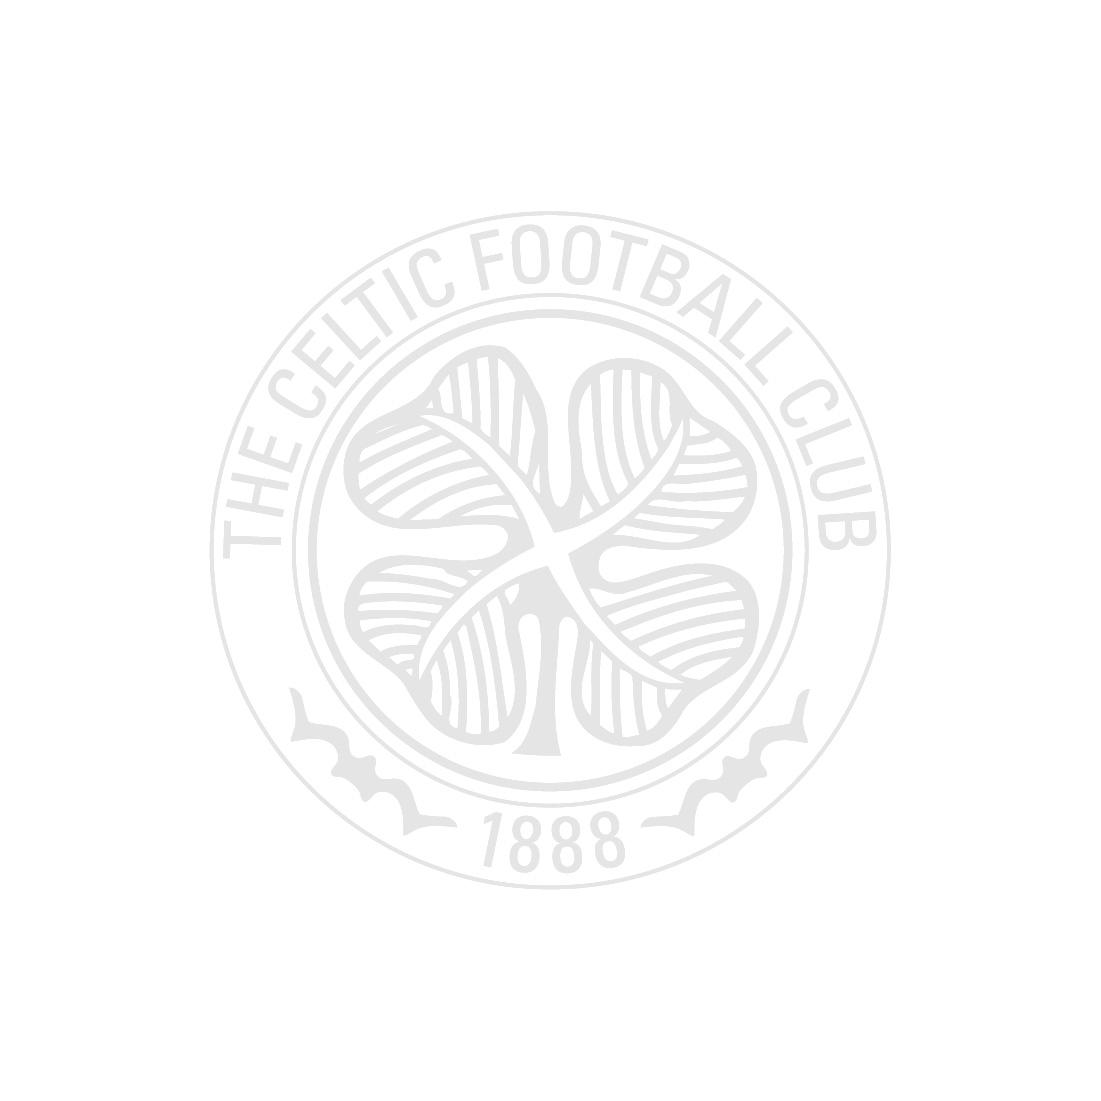 Brendan Rodgers Autobiography